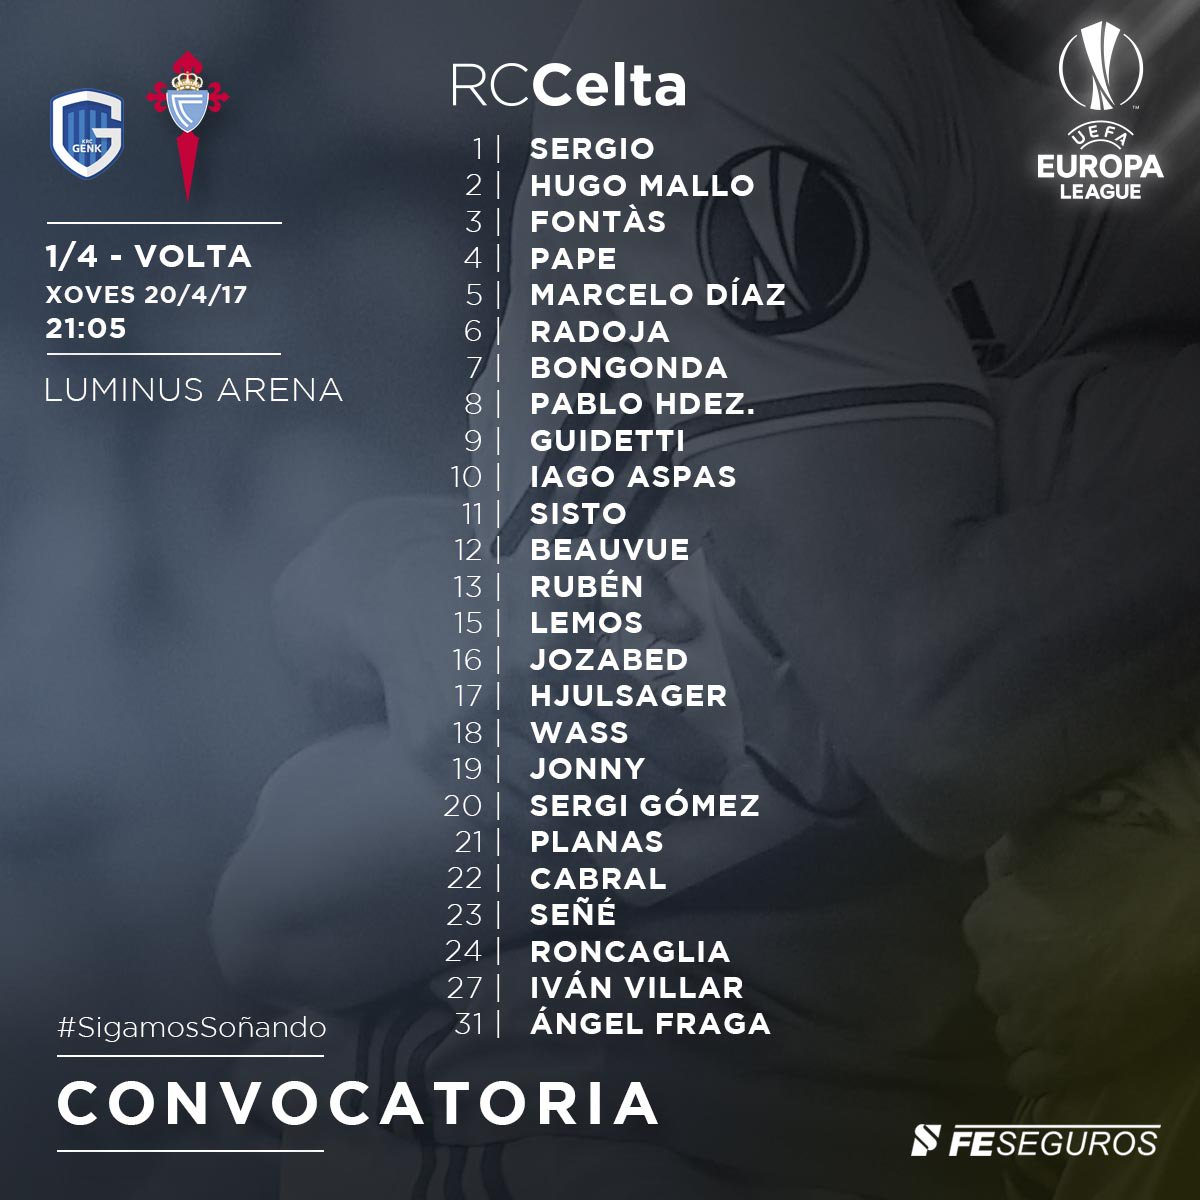 EUROPA LEAGUE CELTA | Temporada 2016 - 2017 C9s_GJRXcAAq4RA